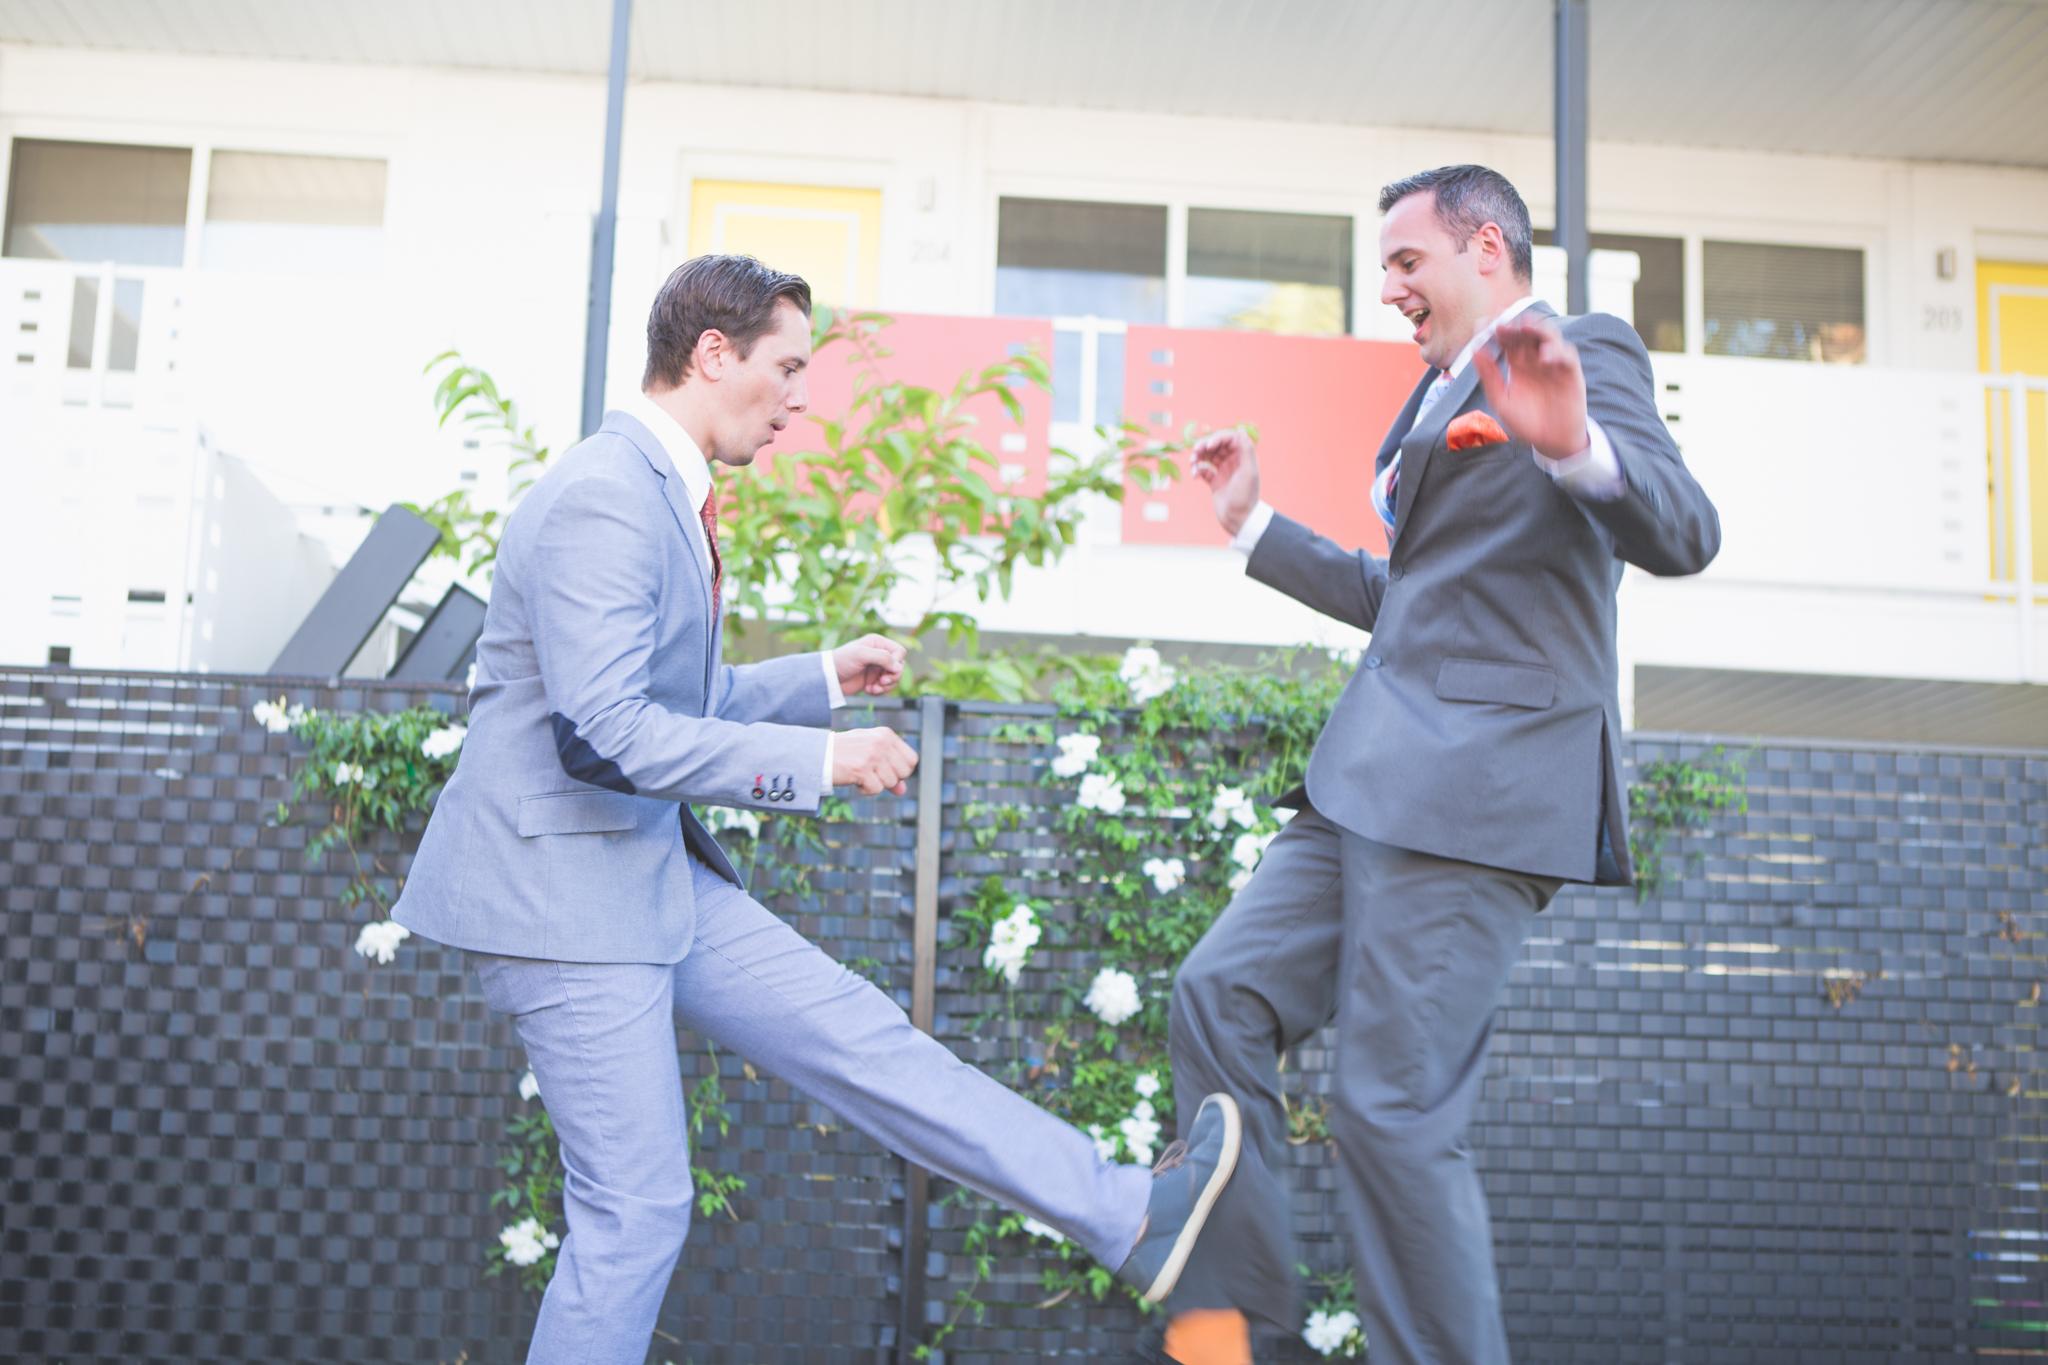 scottsdale-wedding-photographer-el-dorado-brothers-playing